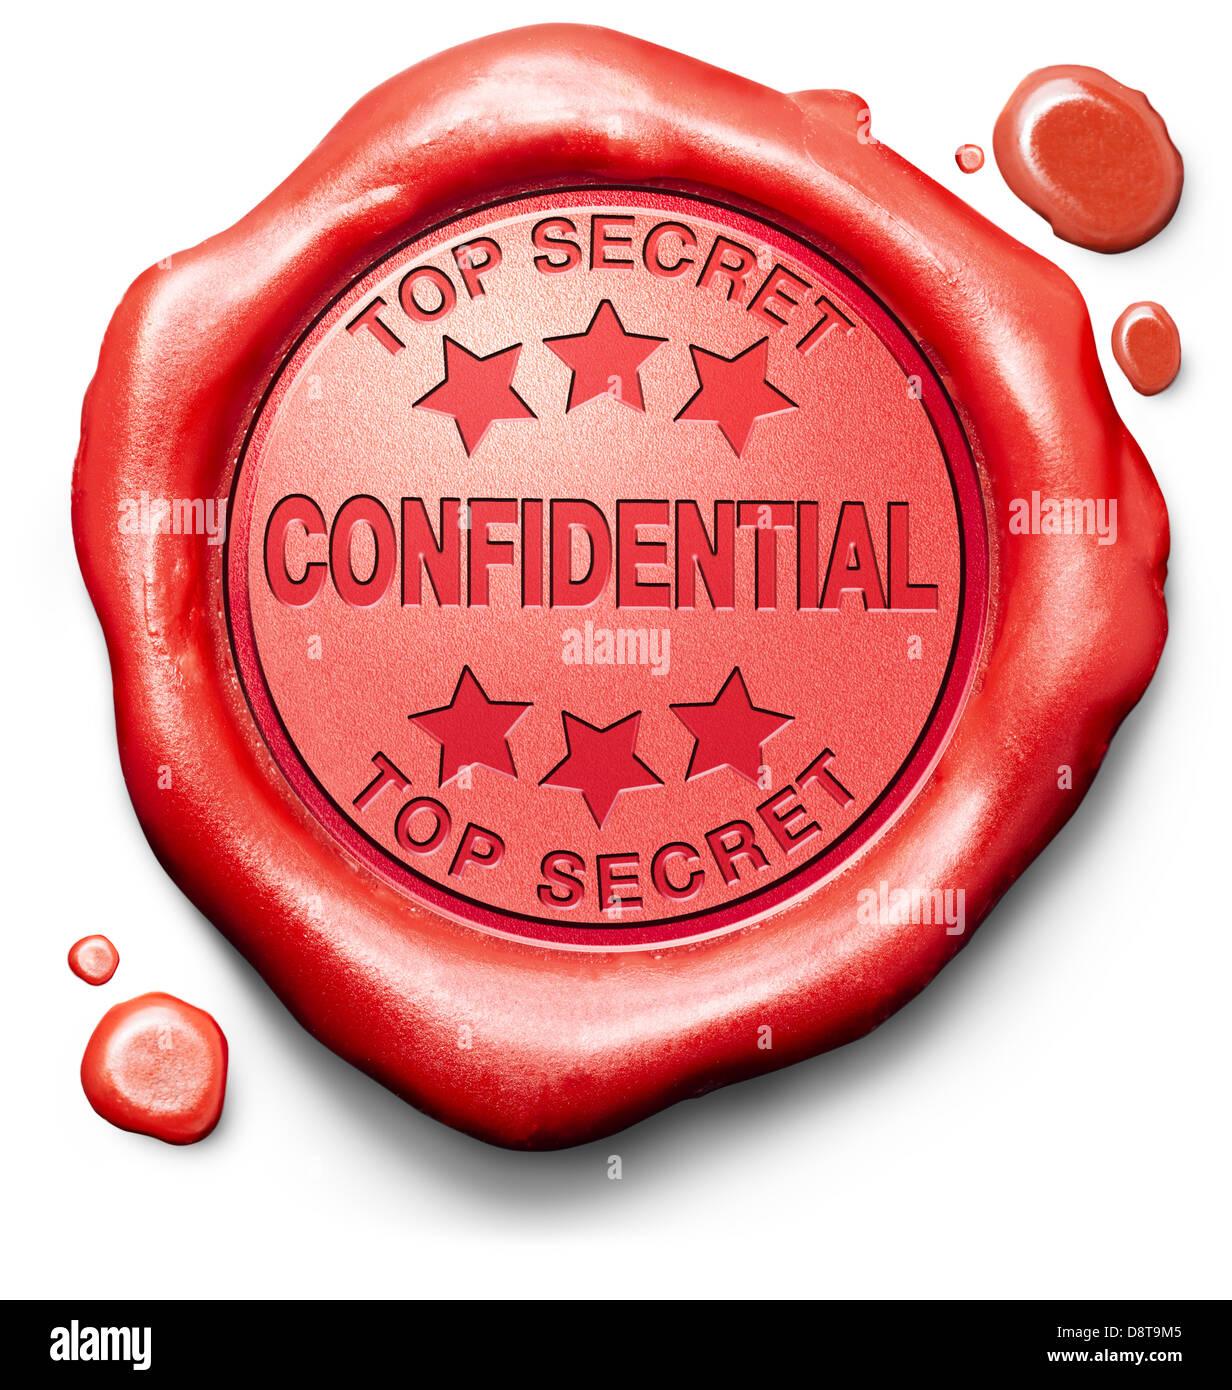 Confidential Label Stock Photos & Confidential Label Stock ...